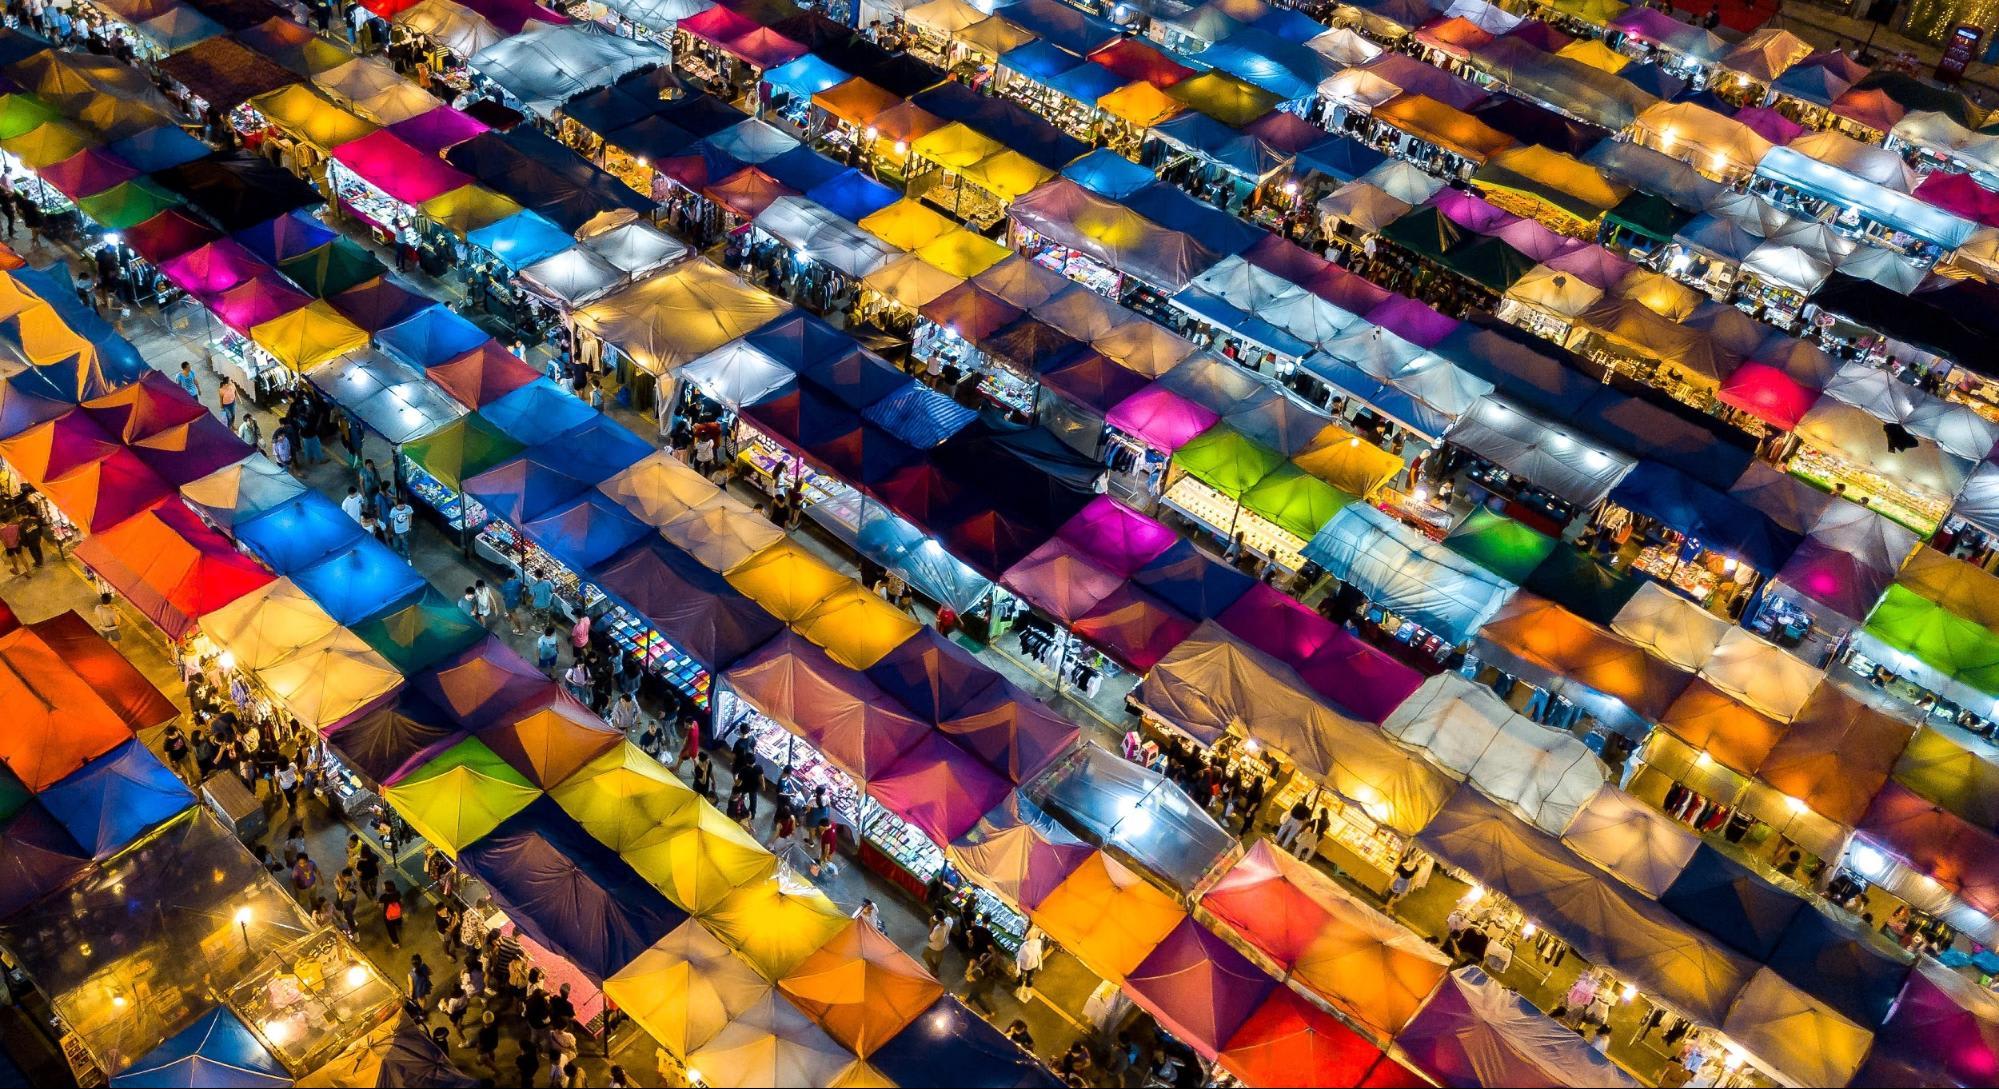 mua sắm tại thái lan: rot fai market